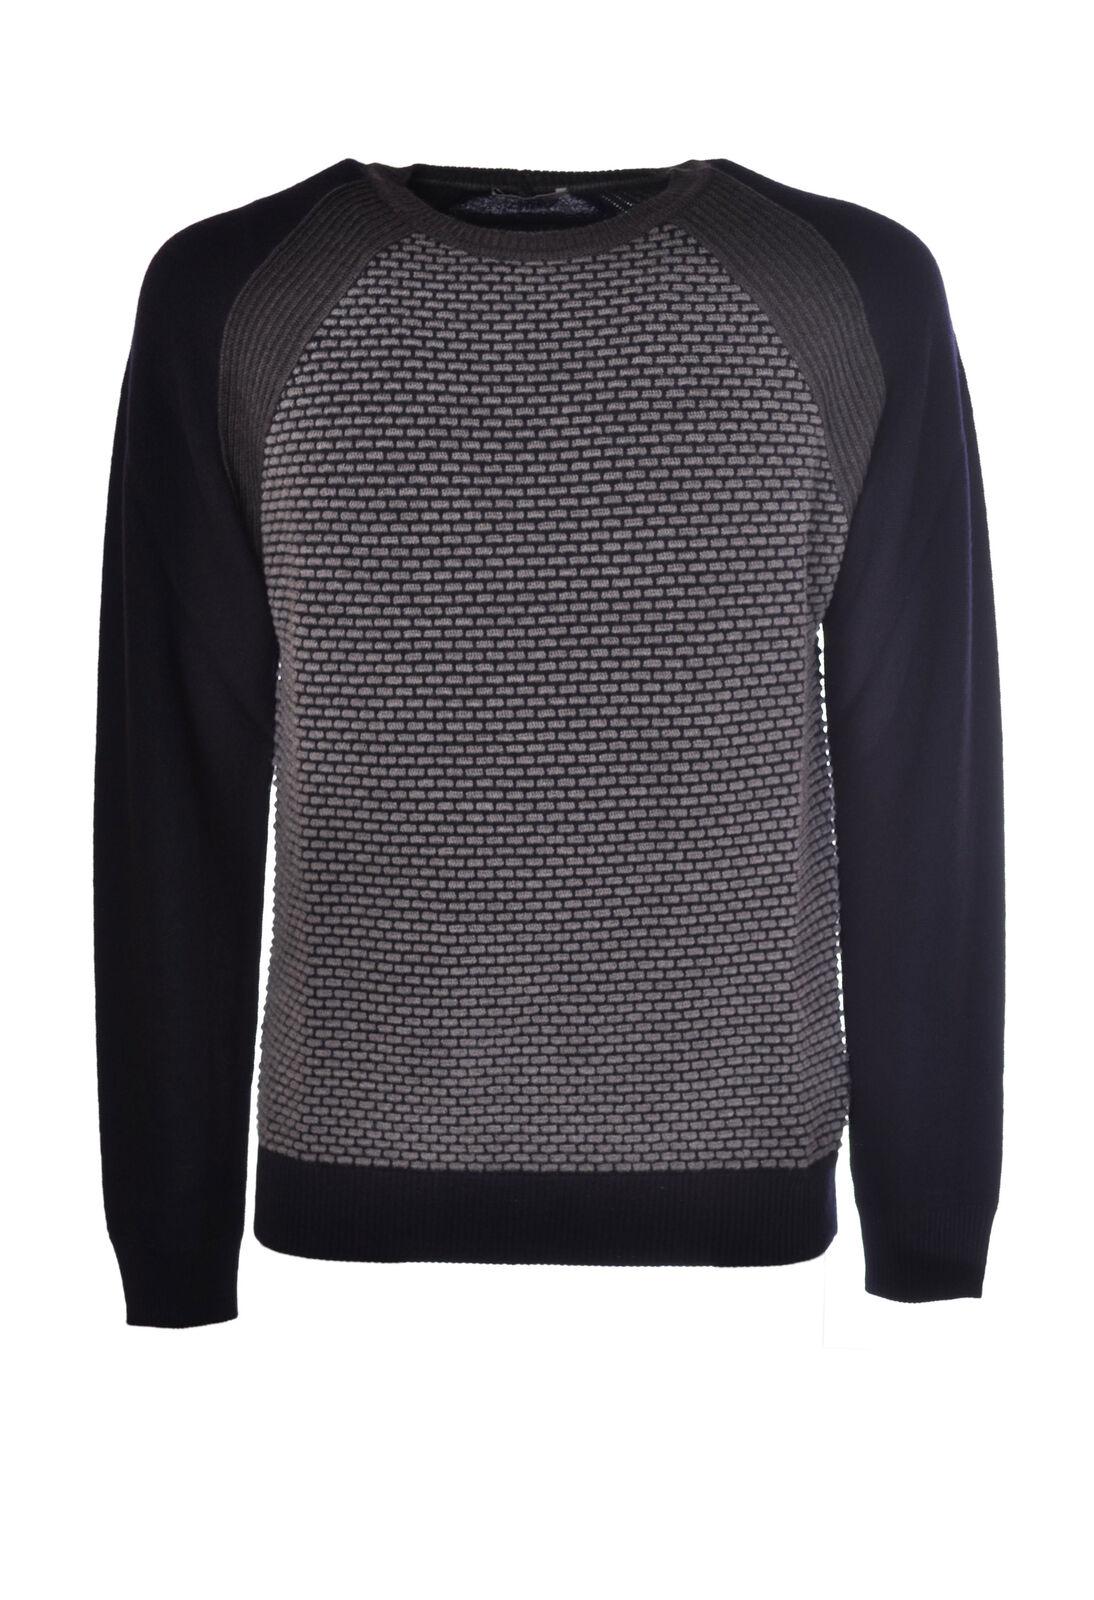 Paolo Pecora  -  Sweaters - Male - Blau - 2777630N173711